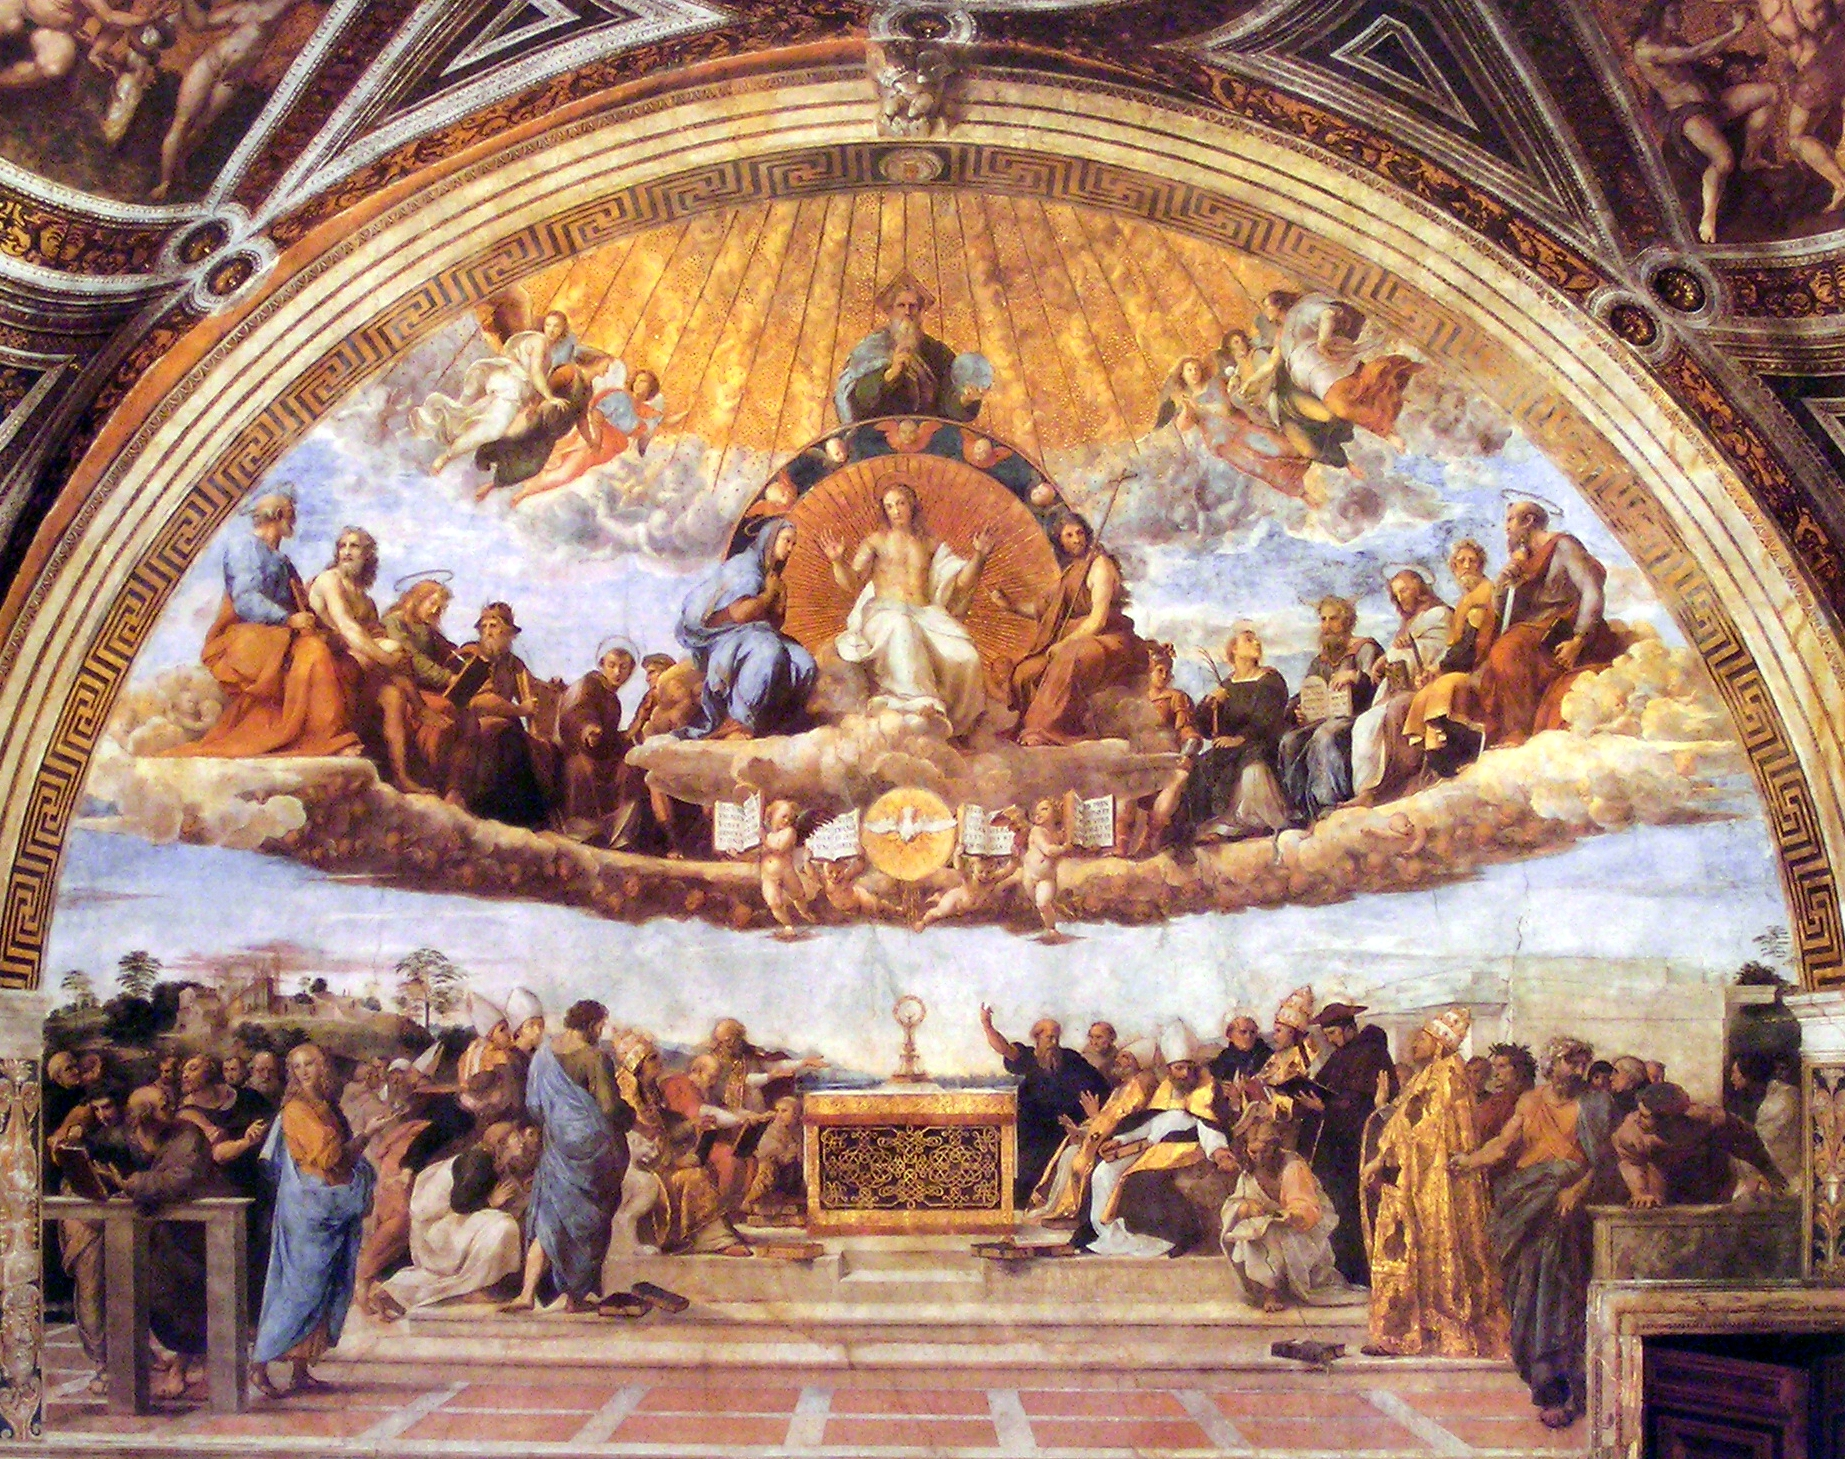 Archivo:Sanzio, Raffaello - Disputa del Sacramento - 1508-1511 - hi